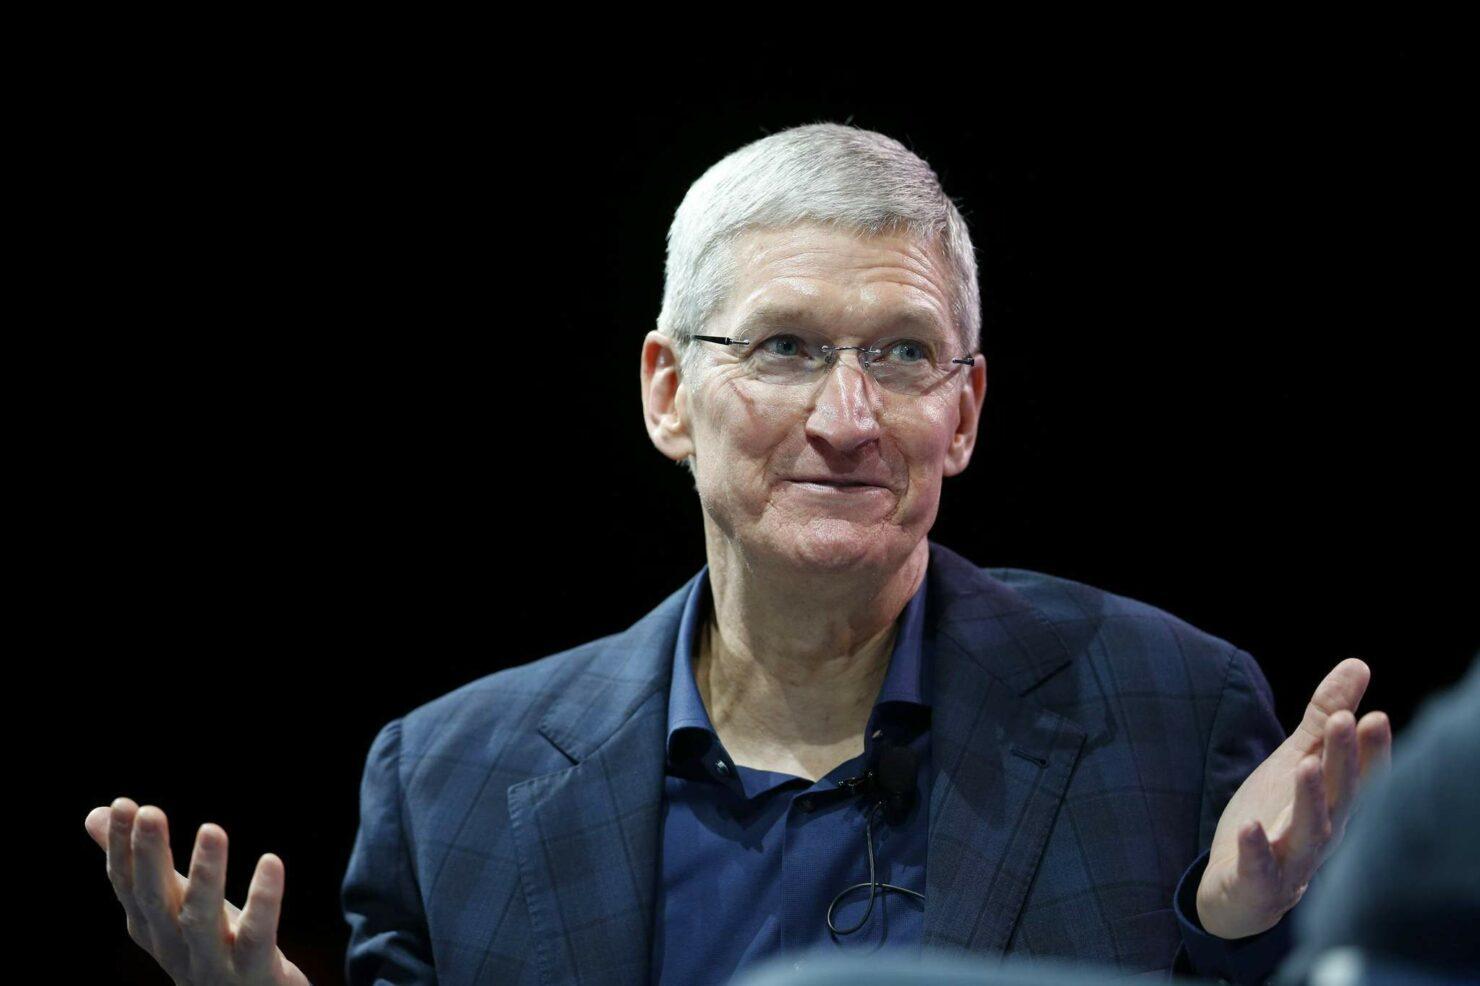 apple ceo apple earnings call